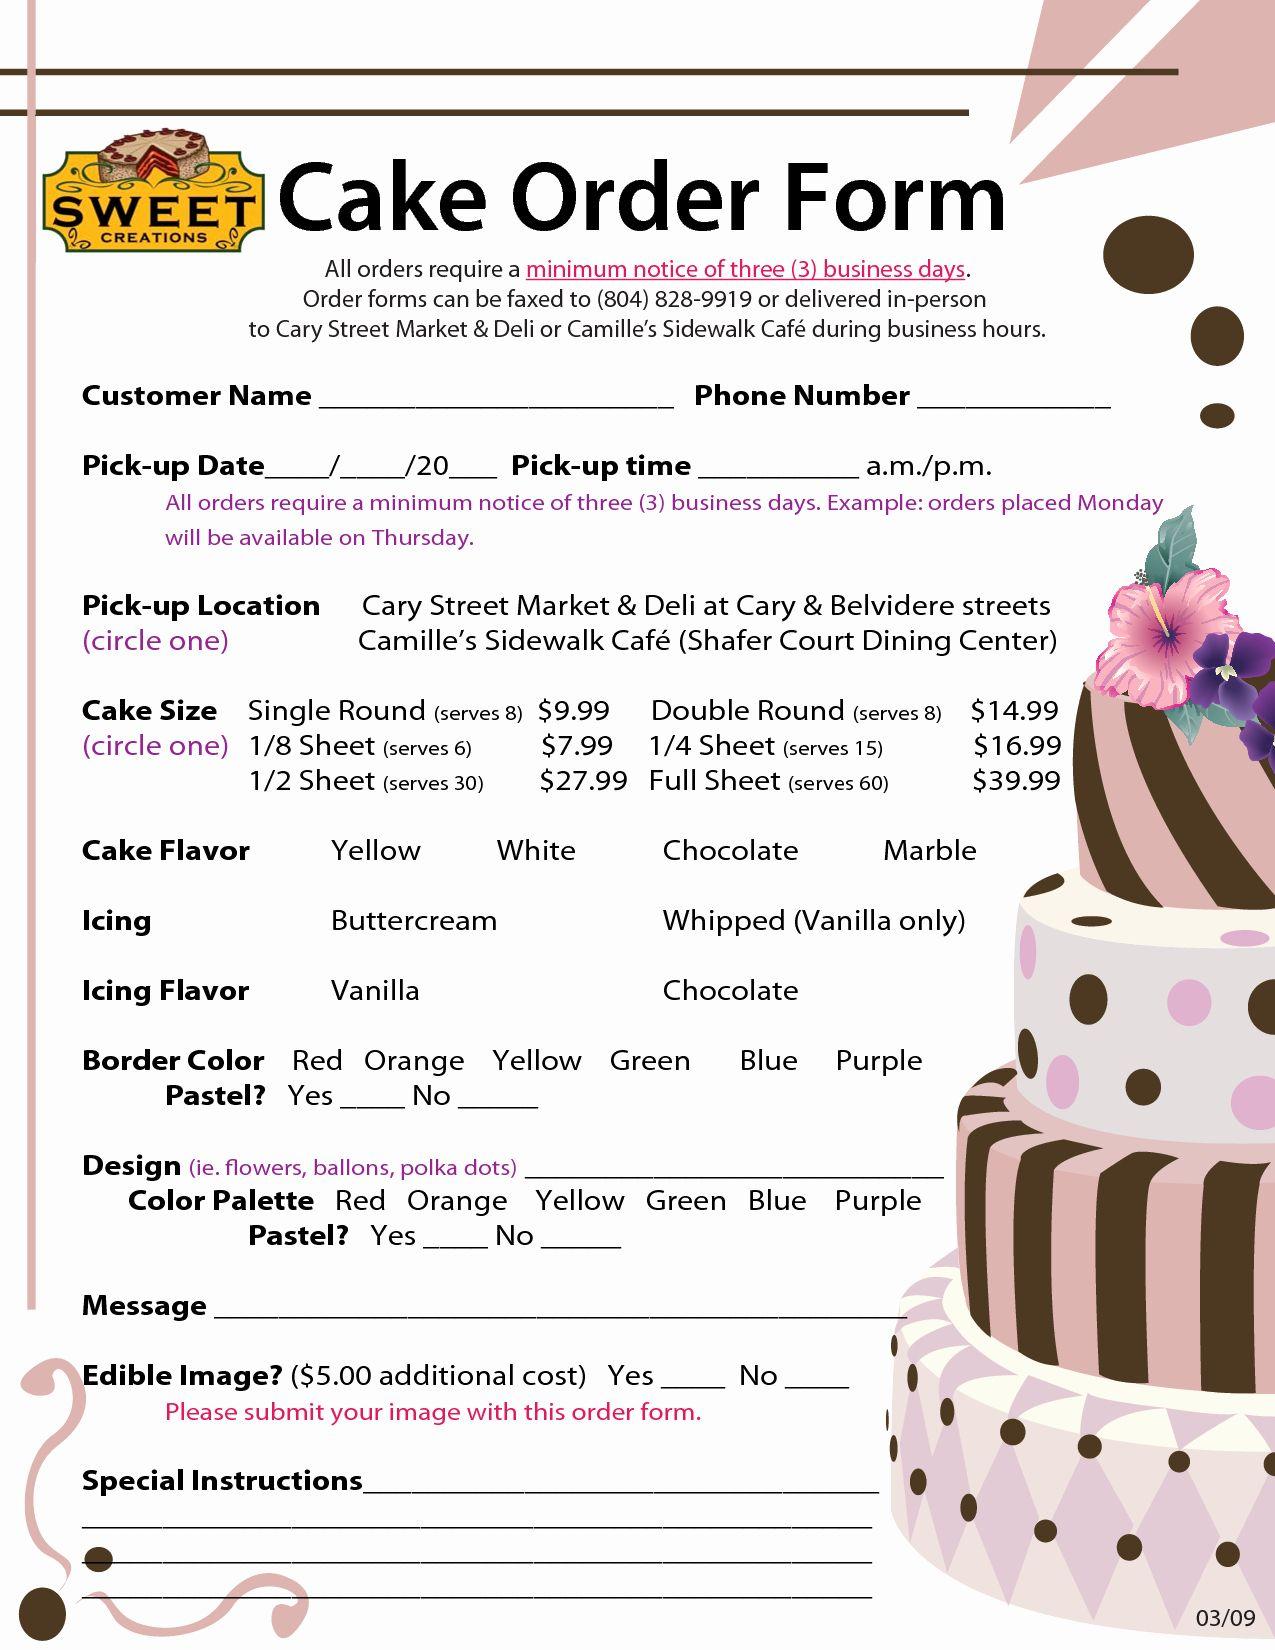 Cake Order Form Templates Microsoft Beautiful Order Forms Cake Negocios Pinterest Cake Business Cake Pricing Cake